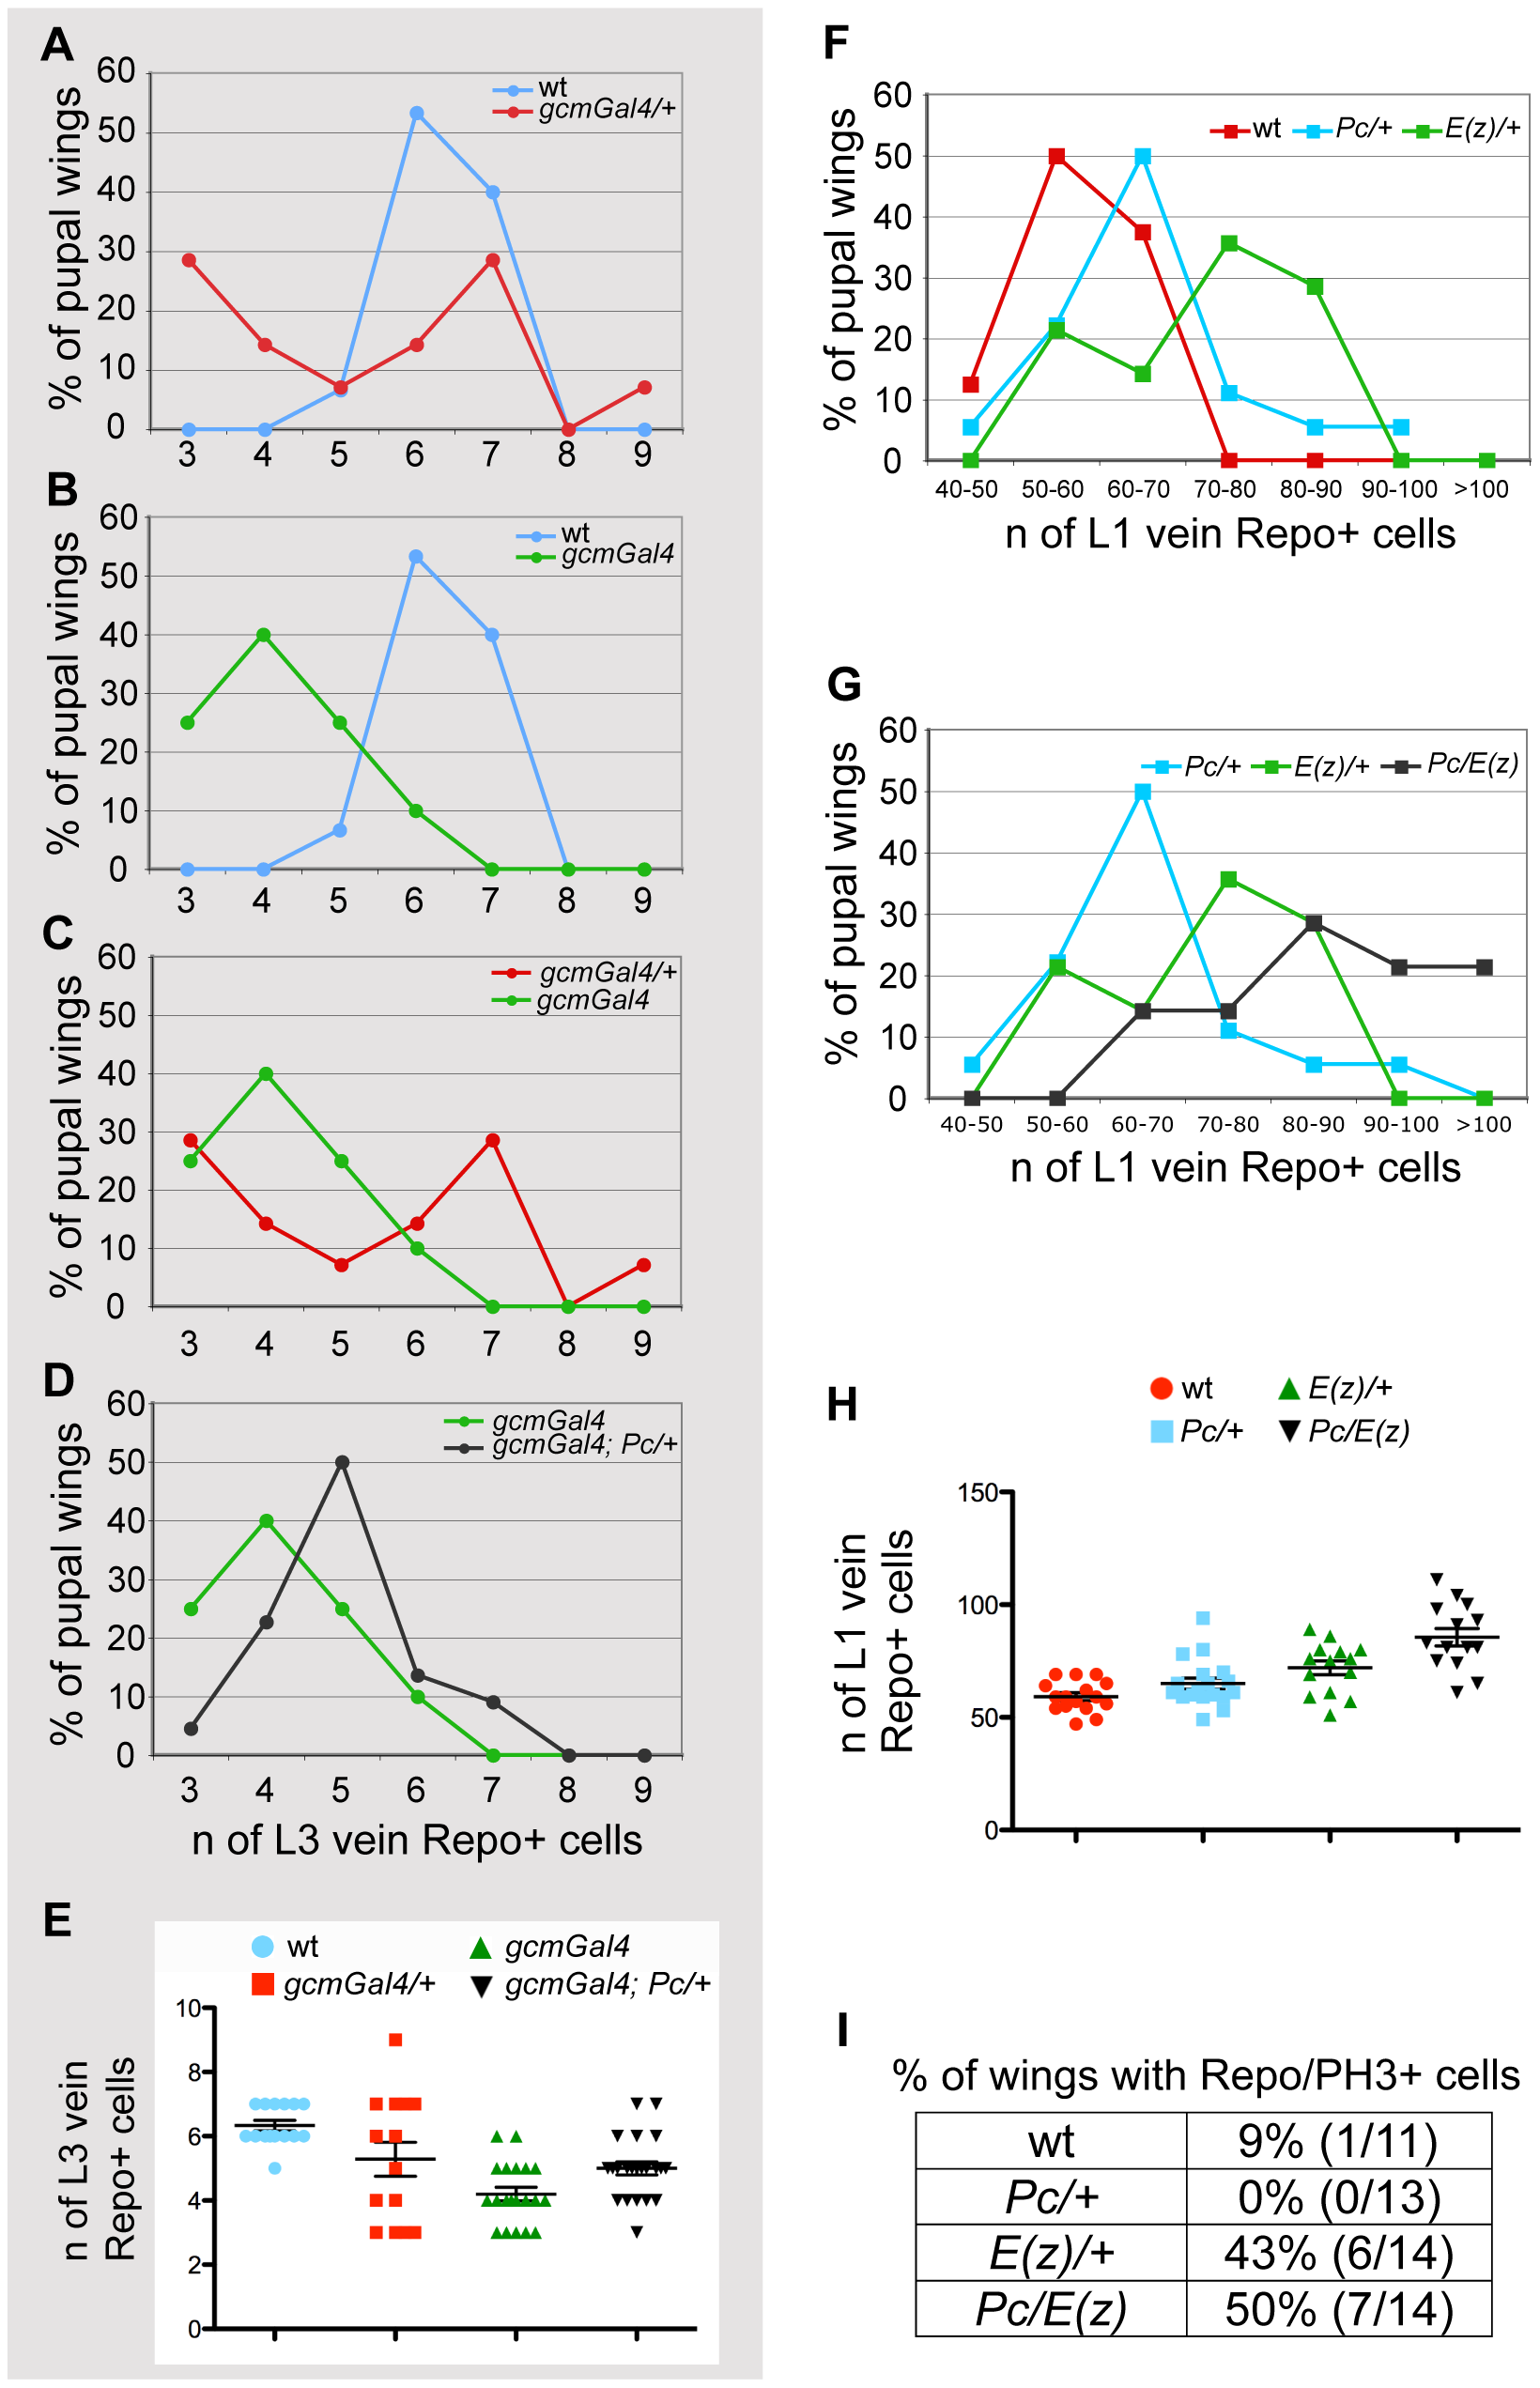 PcG genes control glia proliferation.